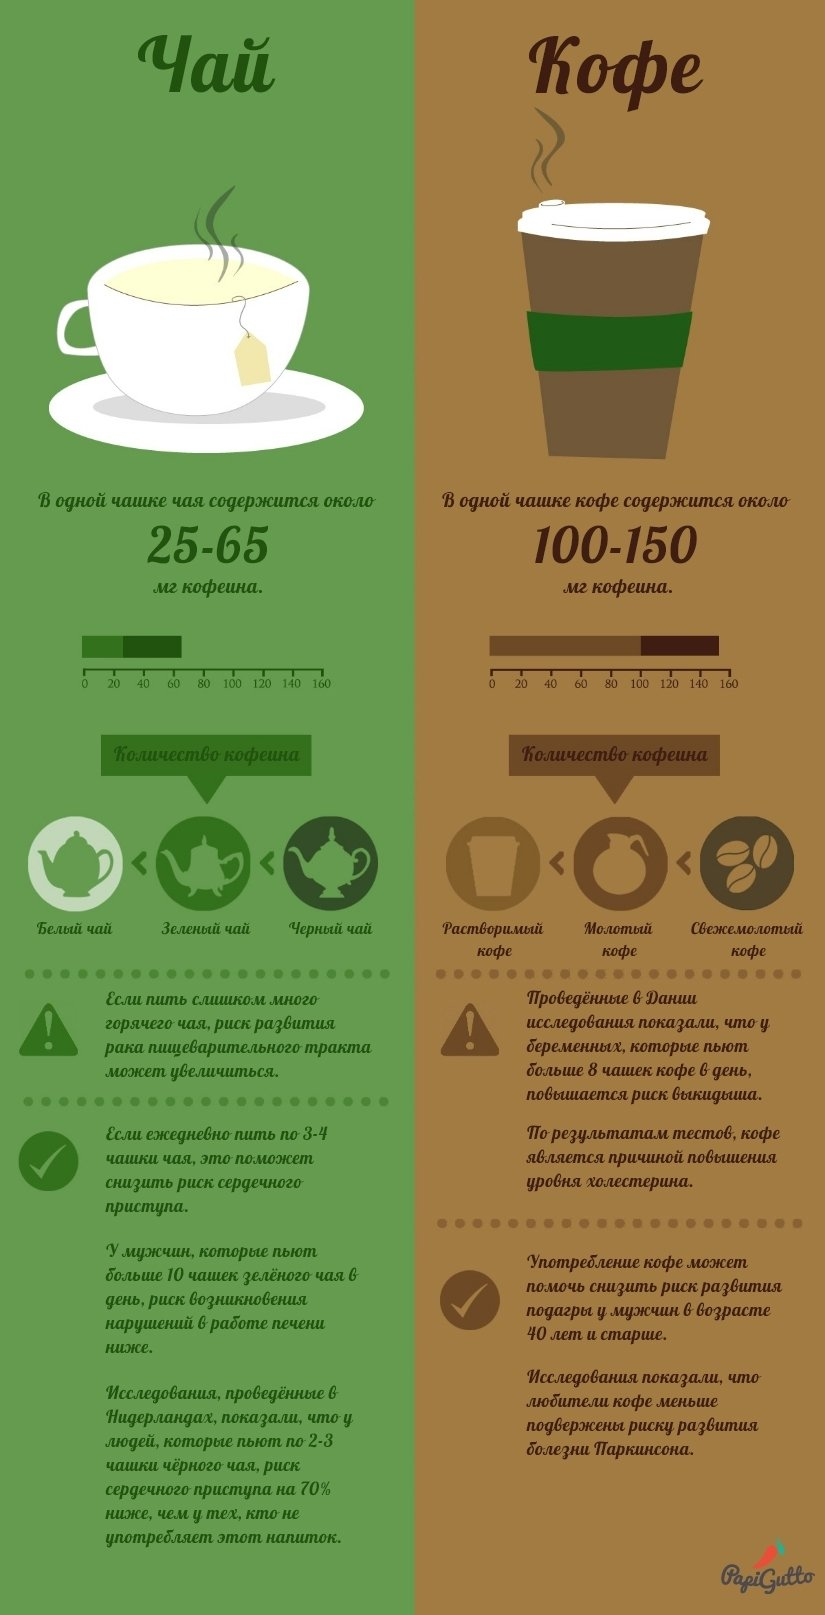 tea-coffee-rus